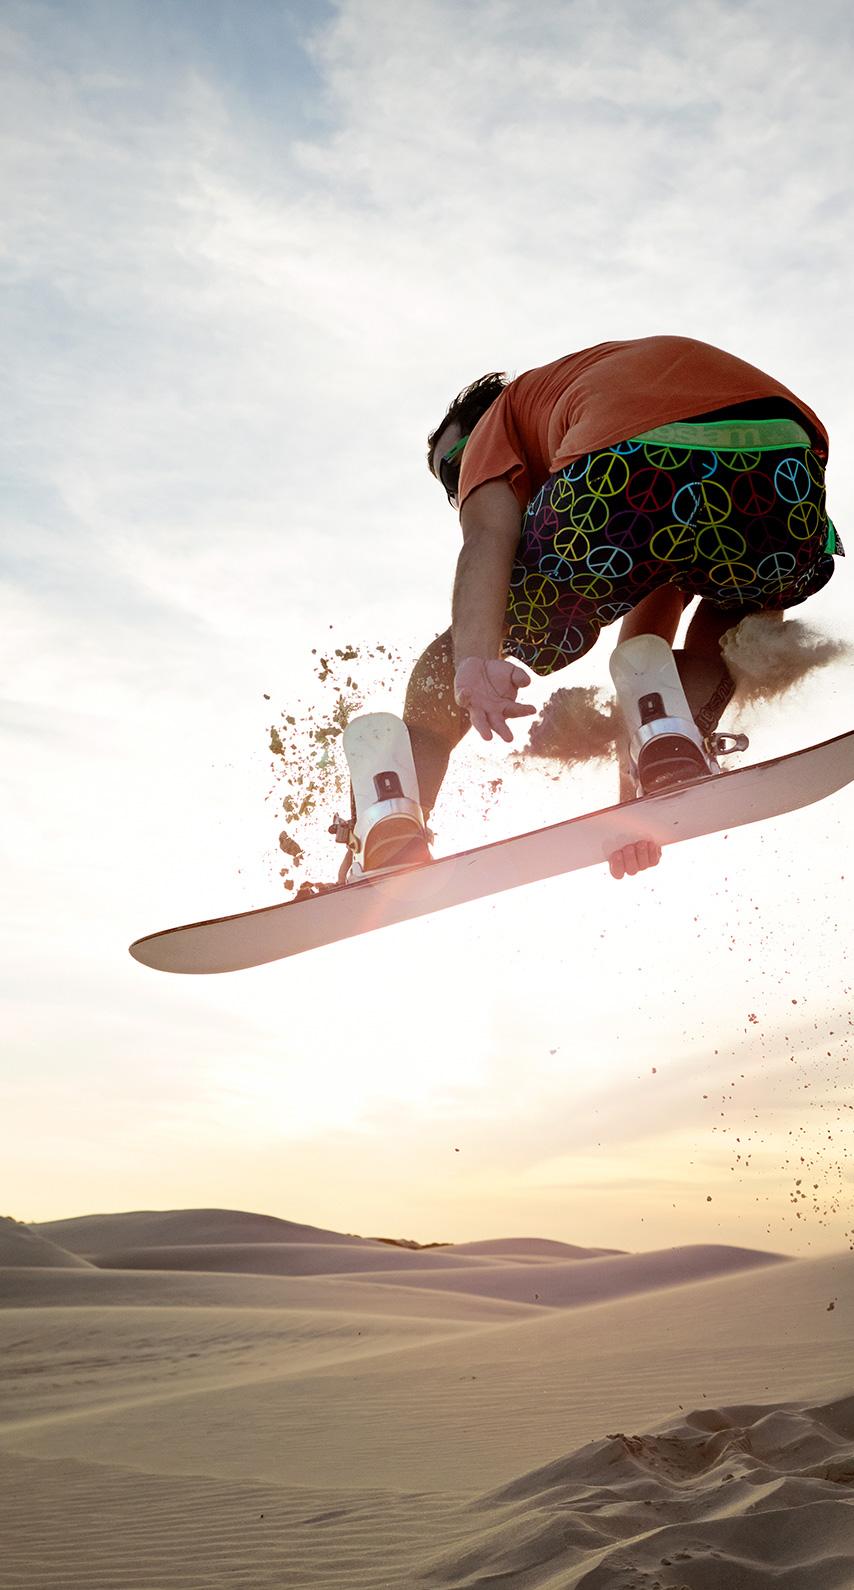 desert, jump